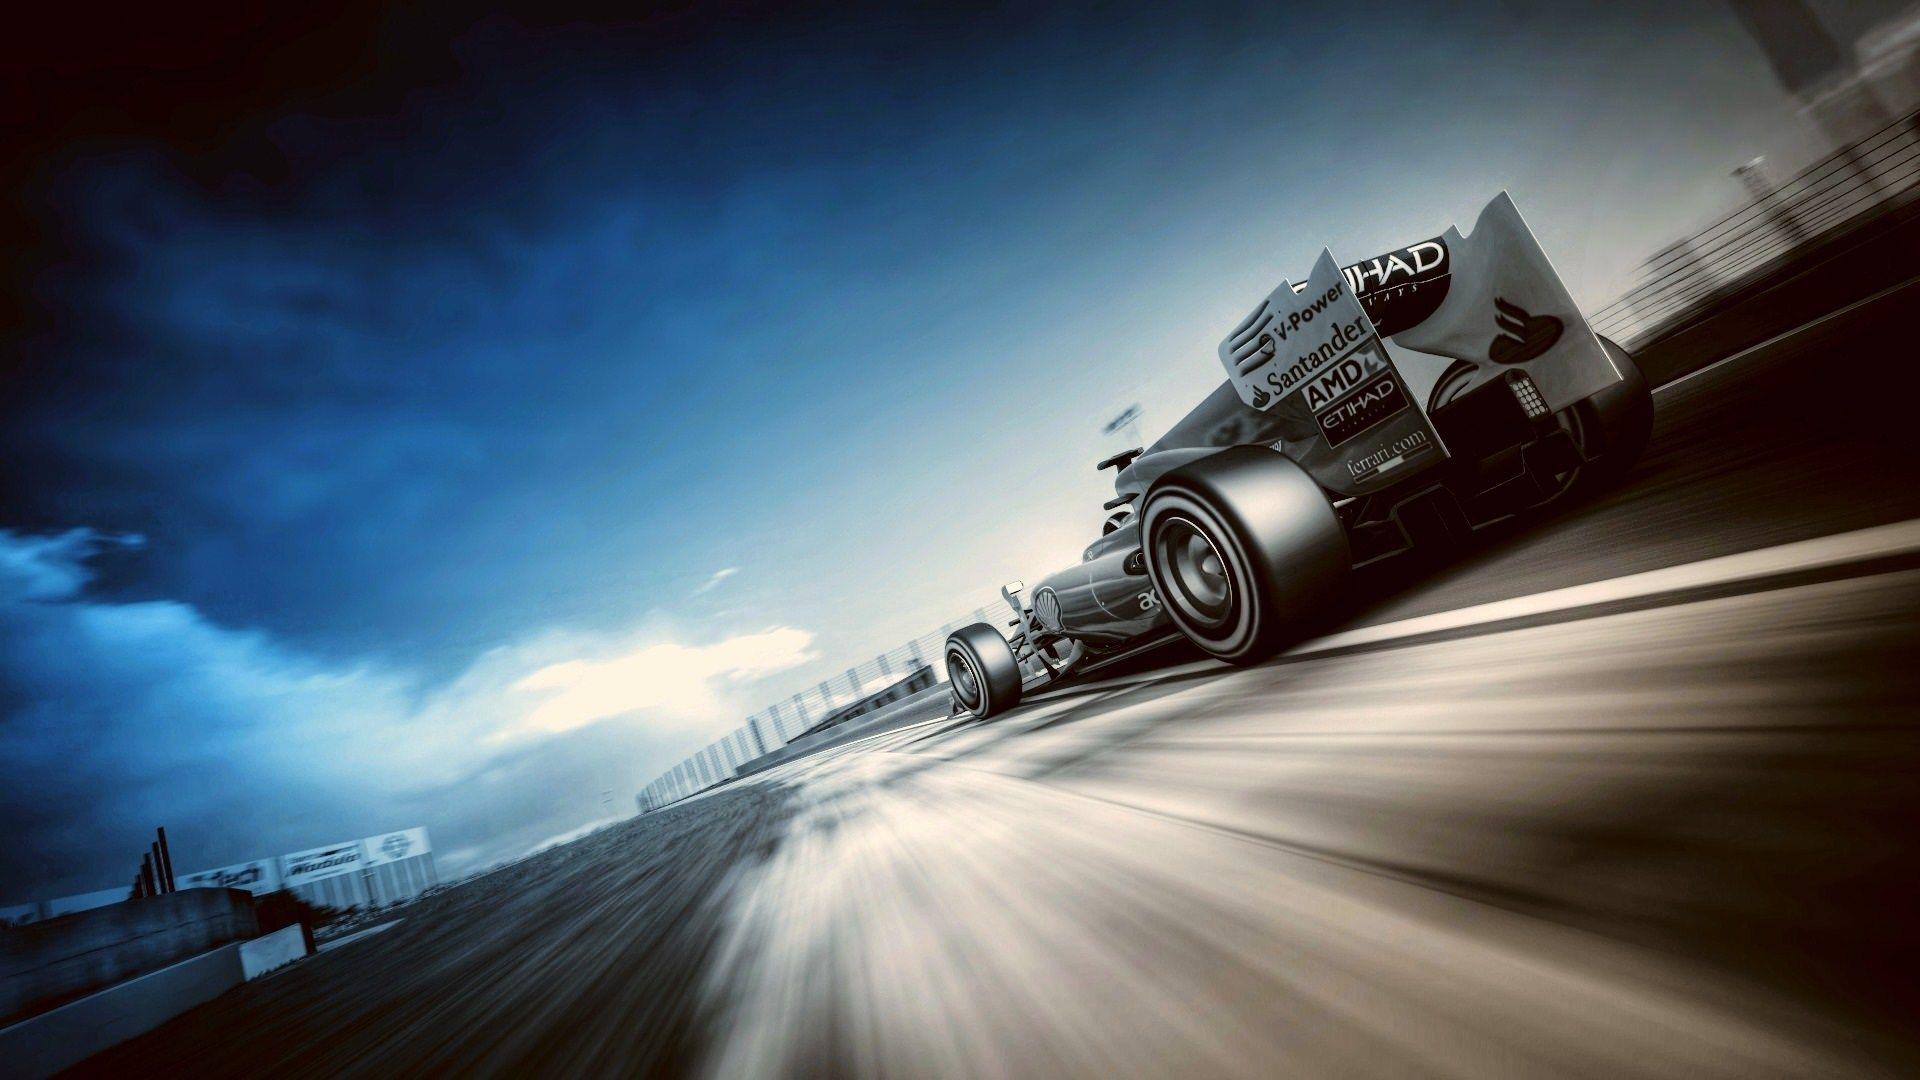 Formula 1 Background Images